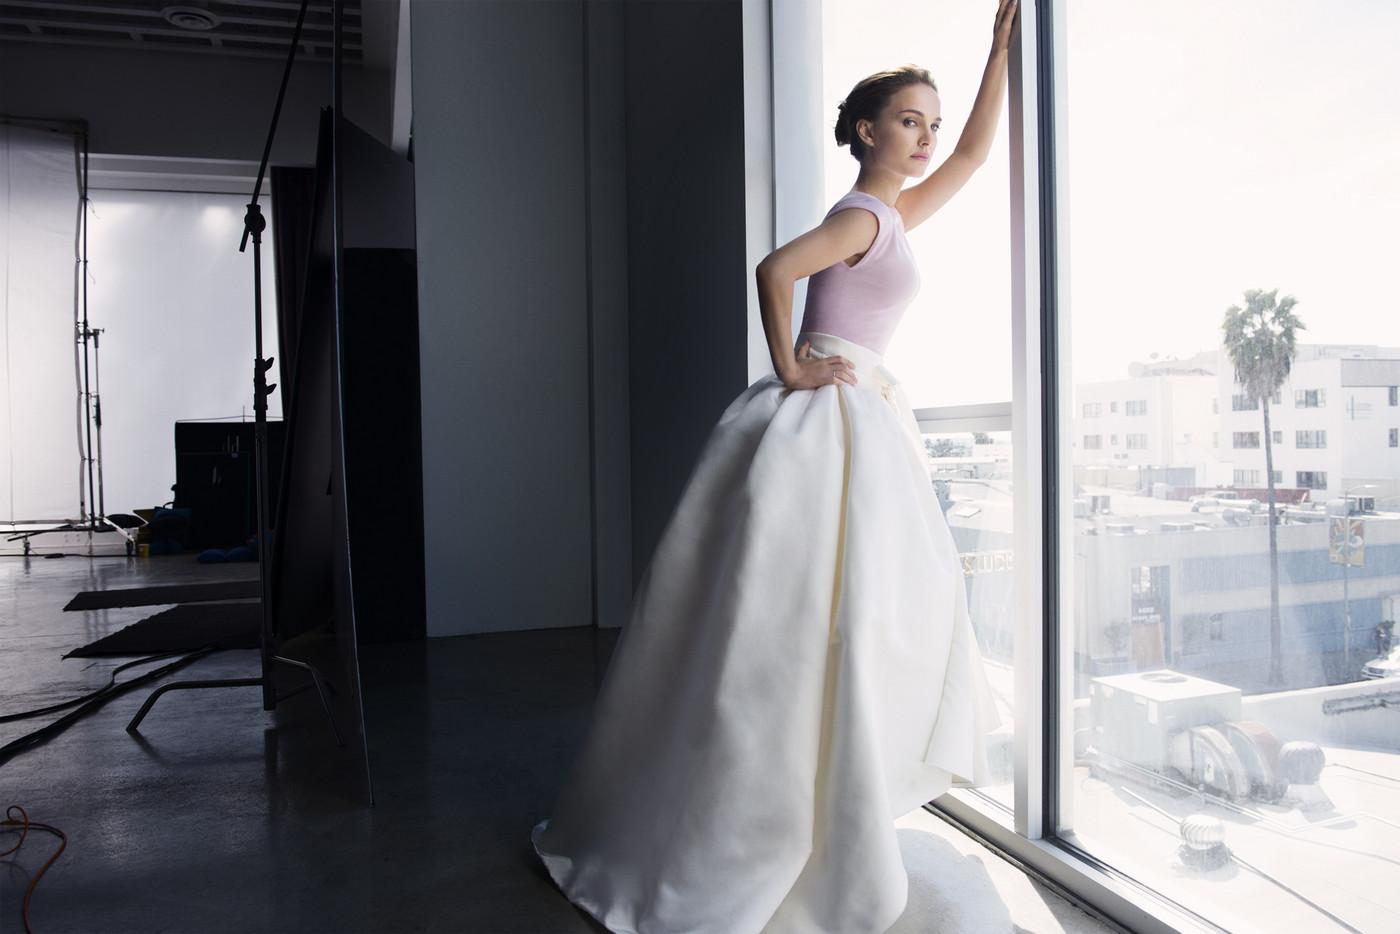 Natalie Portman for DIOR, by Frederic Auerbach